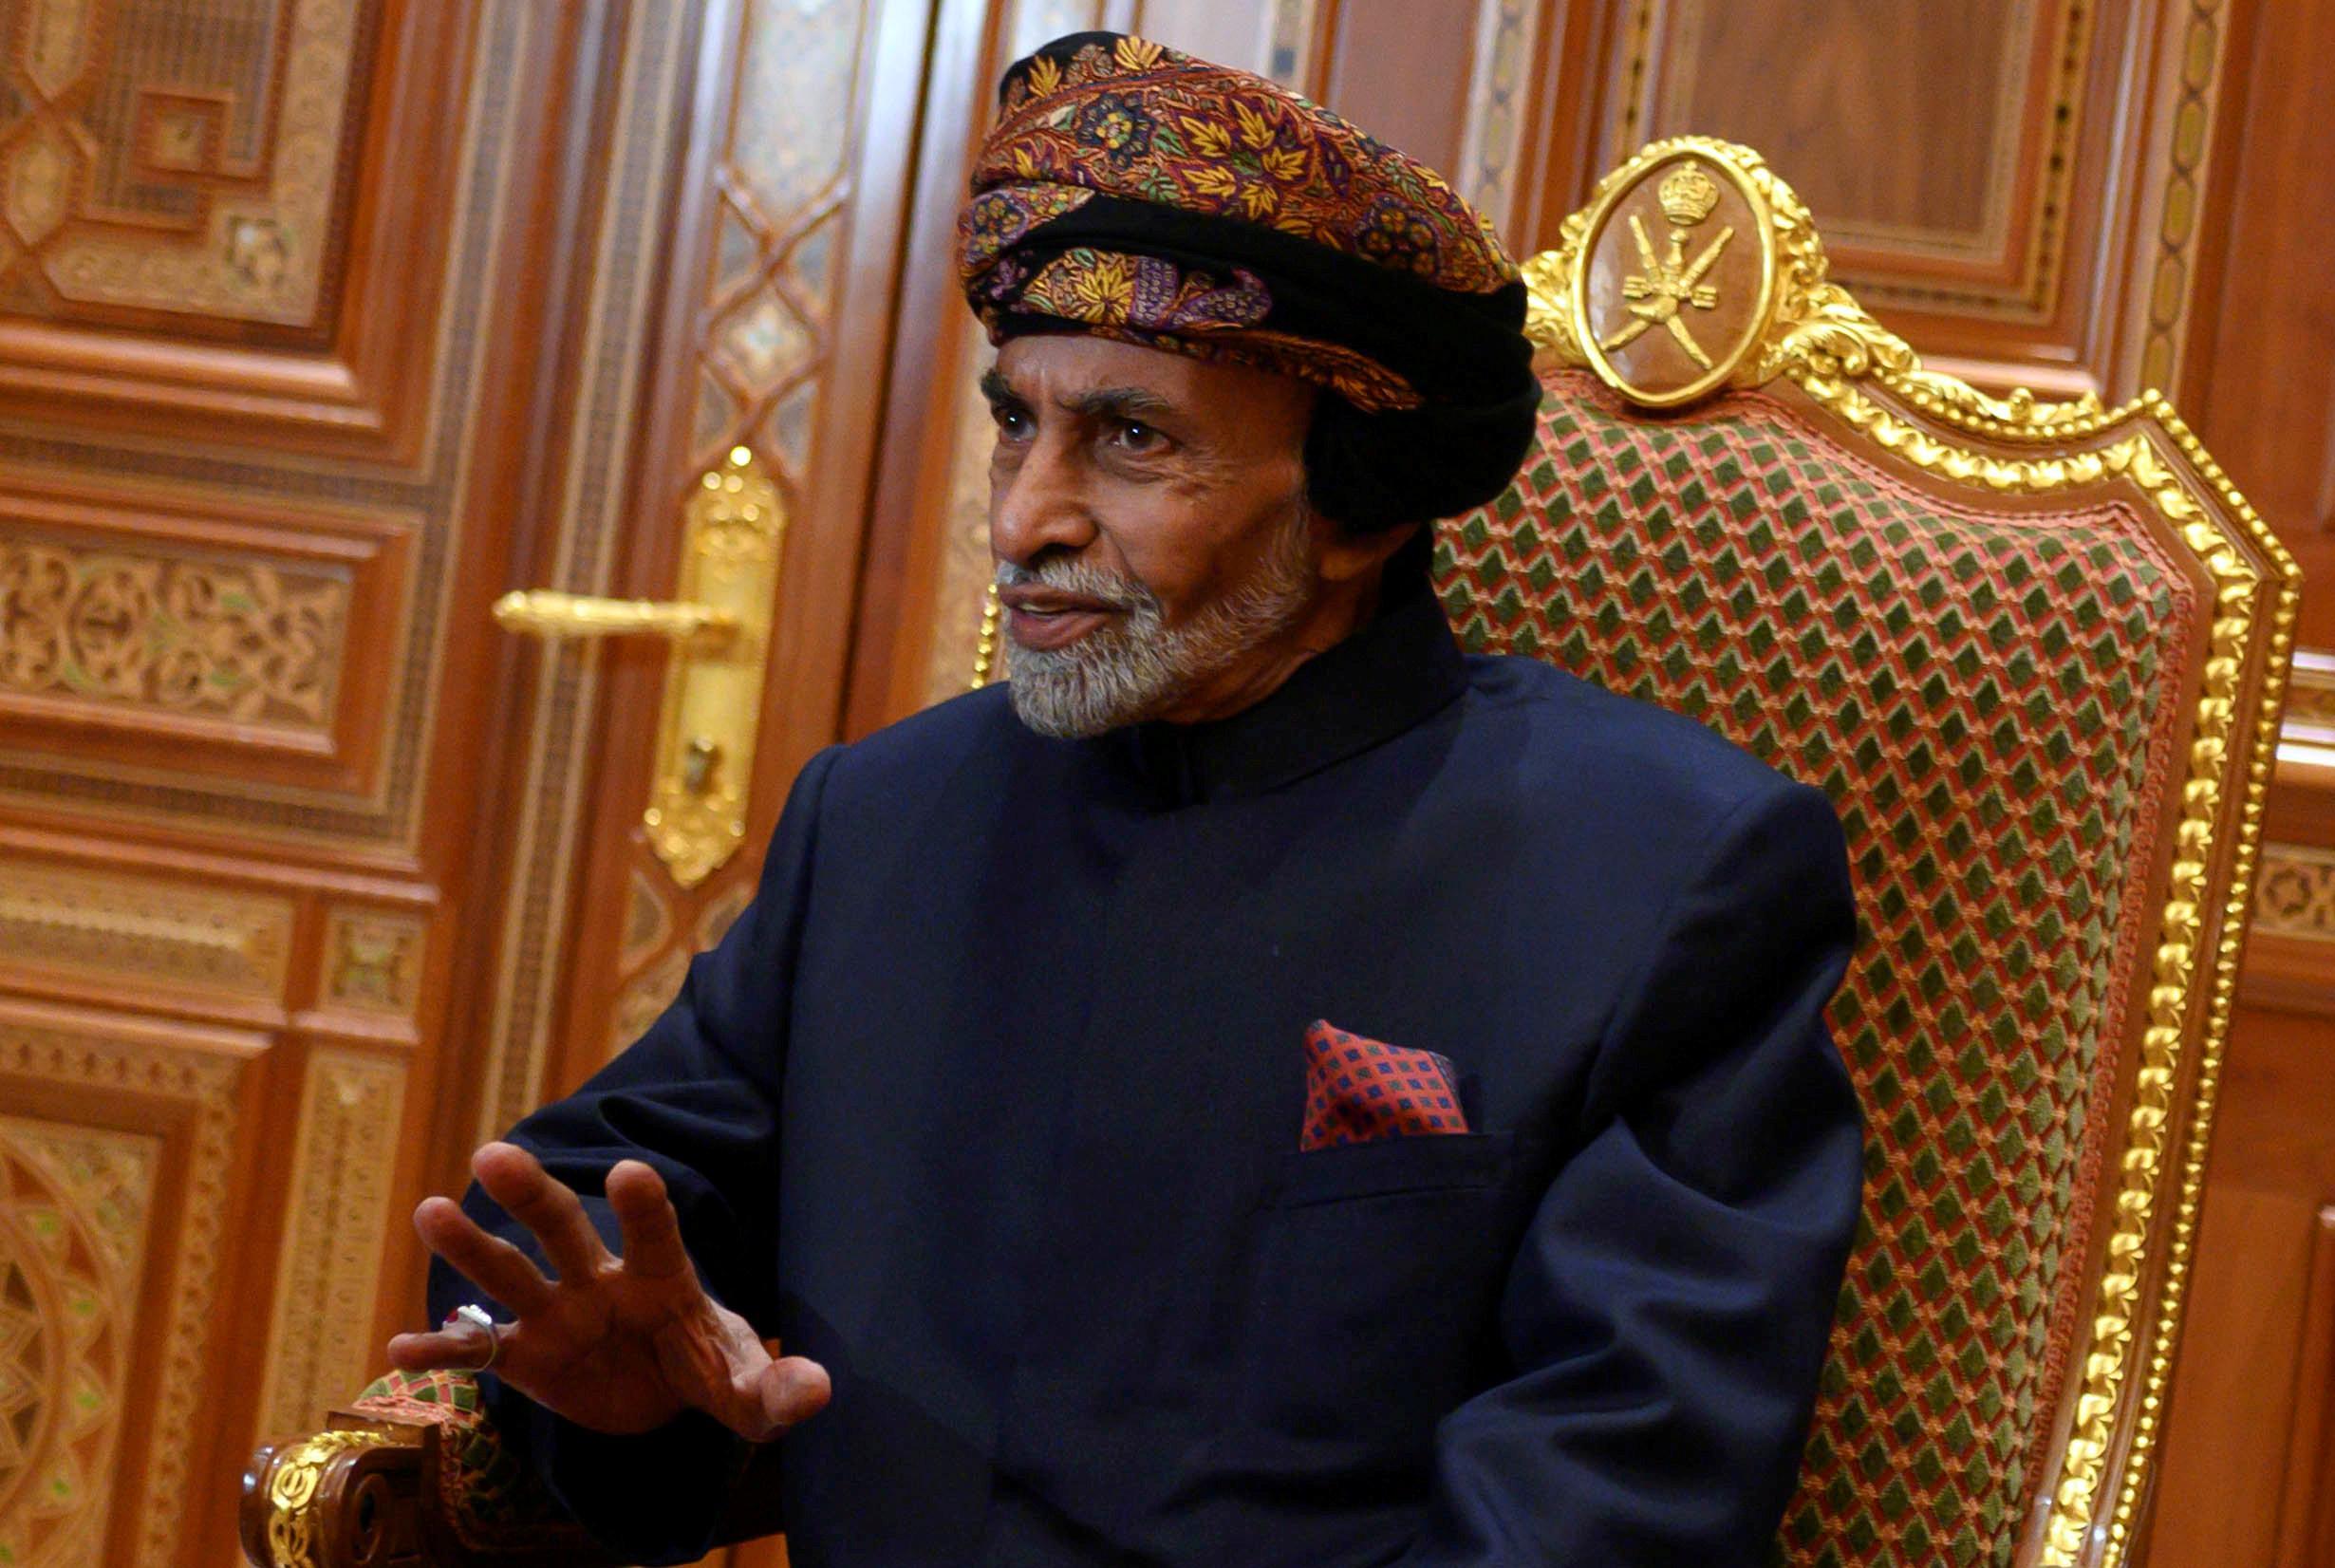 Qaboos of Oman to undergo medical checks in Belgium